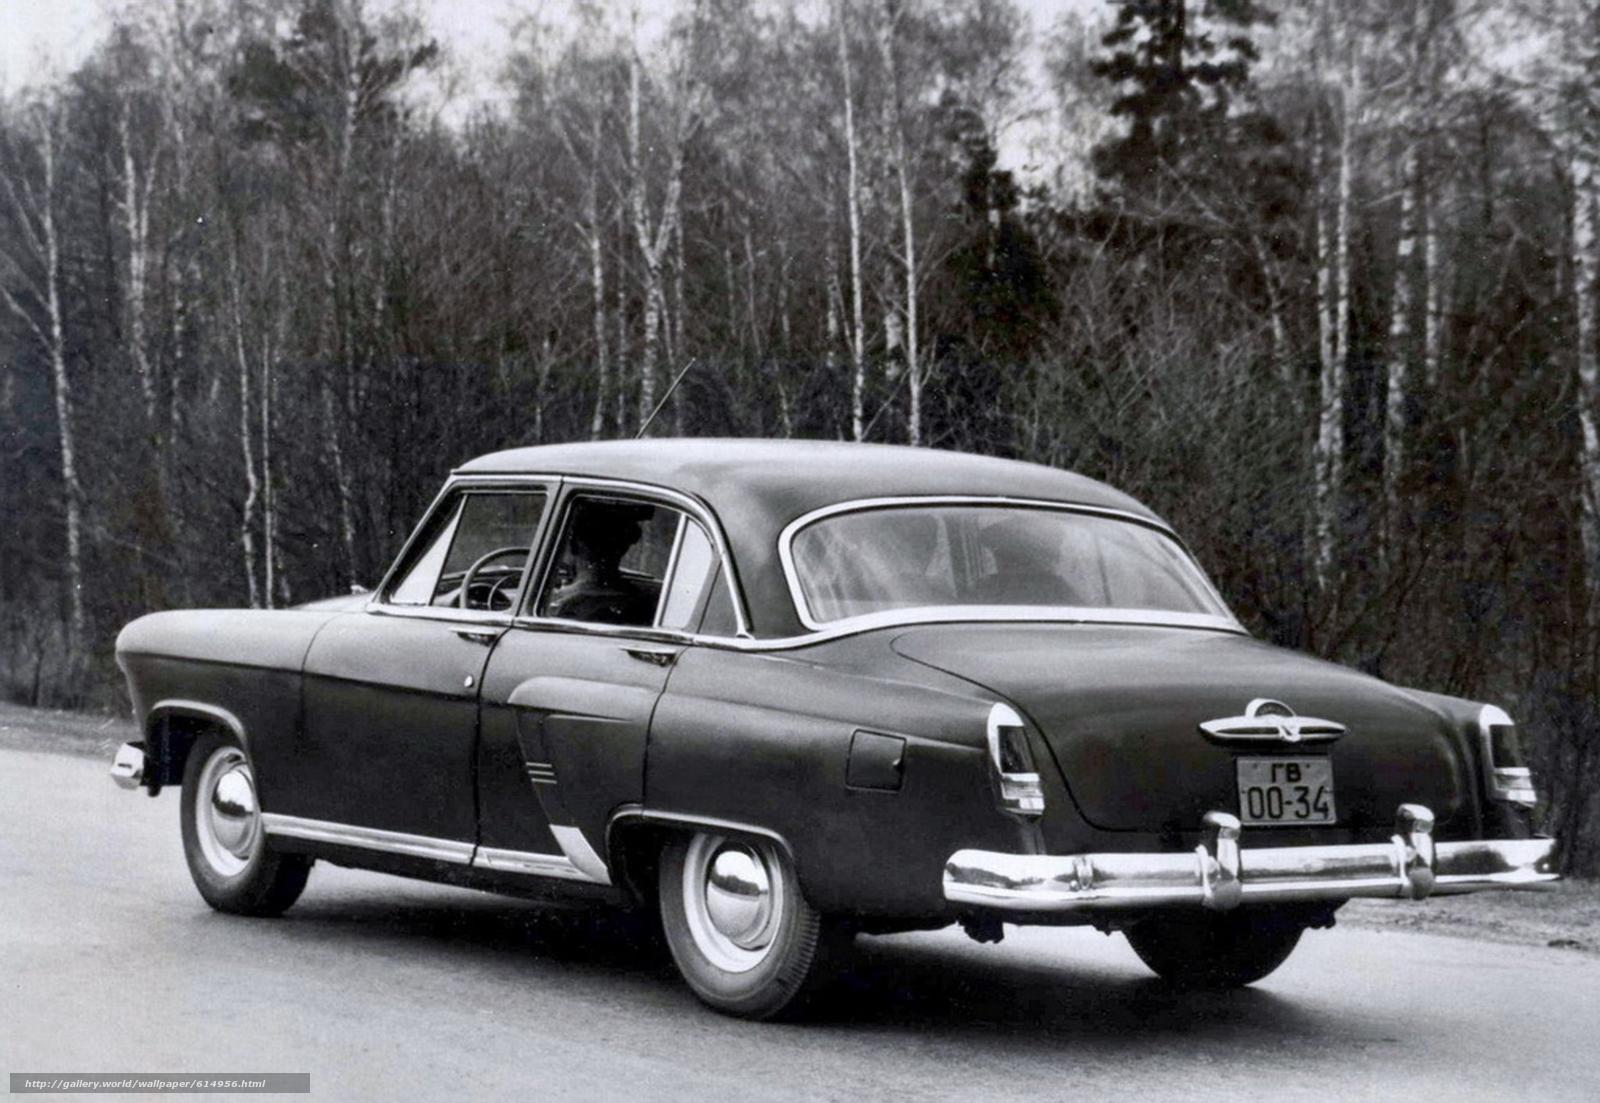 Download wallpaper gas,  Gas-21,  Volga,  1954 free desktop wallpaper in the resolution 1920x1324 — picture №614956